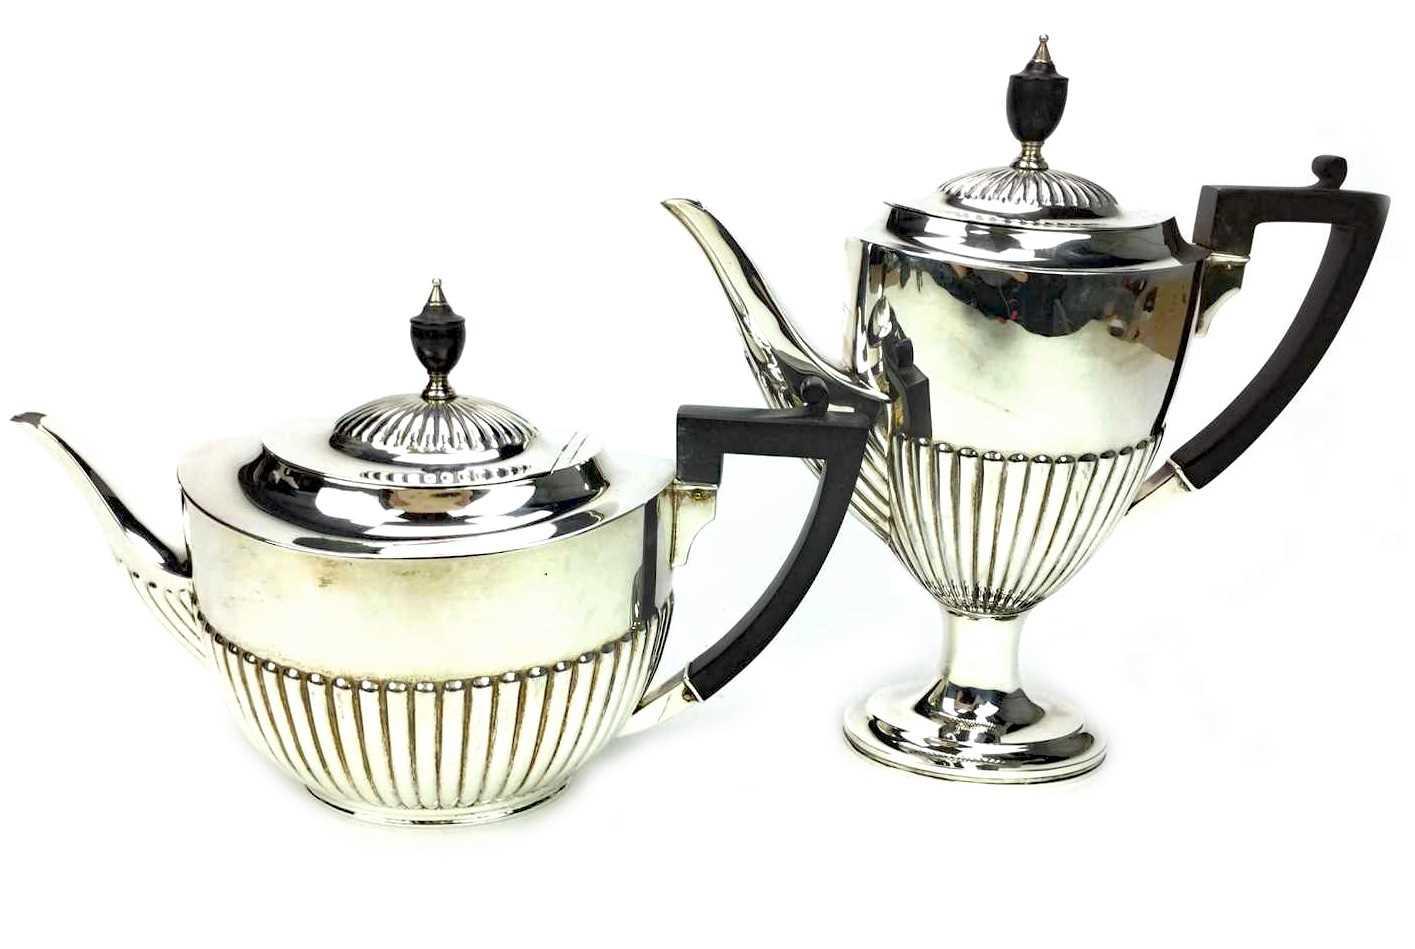 Lot 846 - AN EDWARD VII SILVER COFFEE POT AND TEA POT